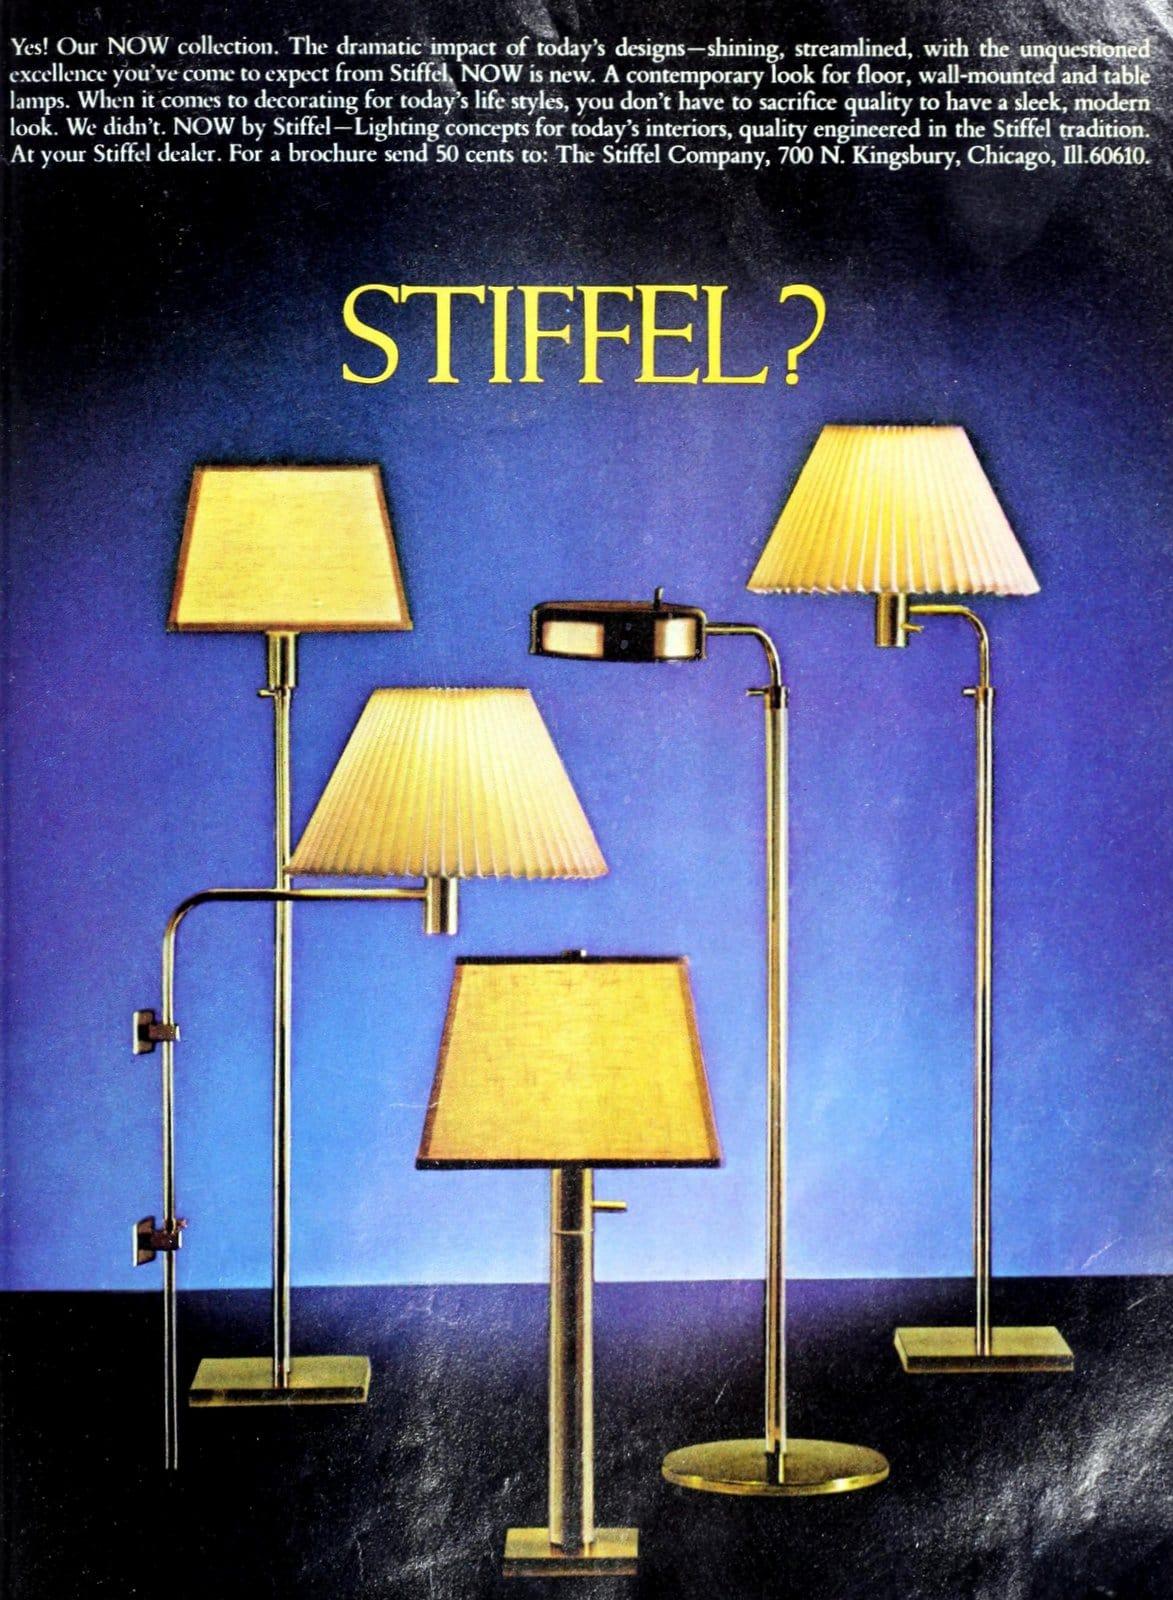 Vintage brass Stiffel lamps (1979)